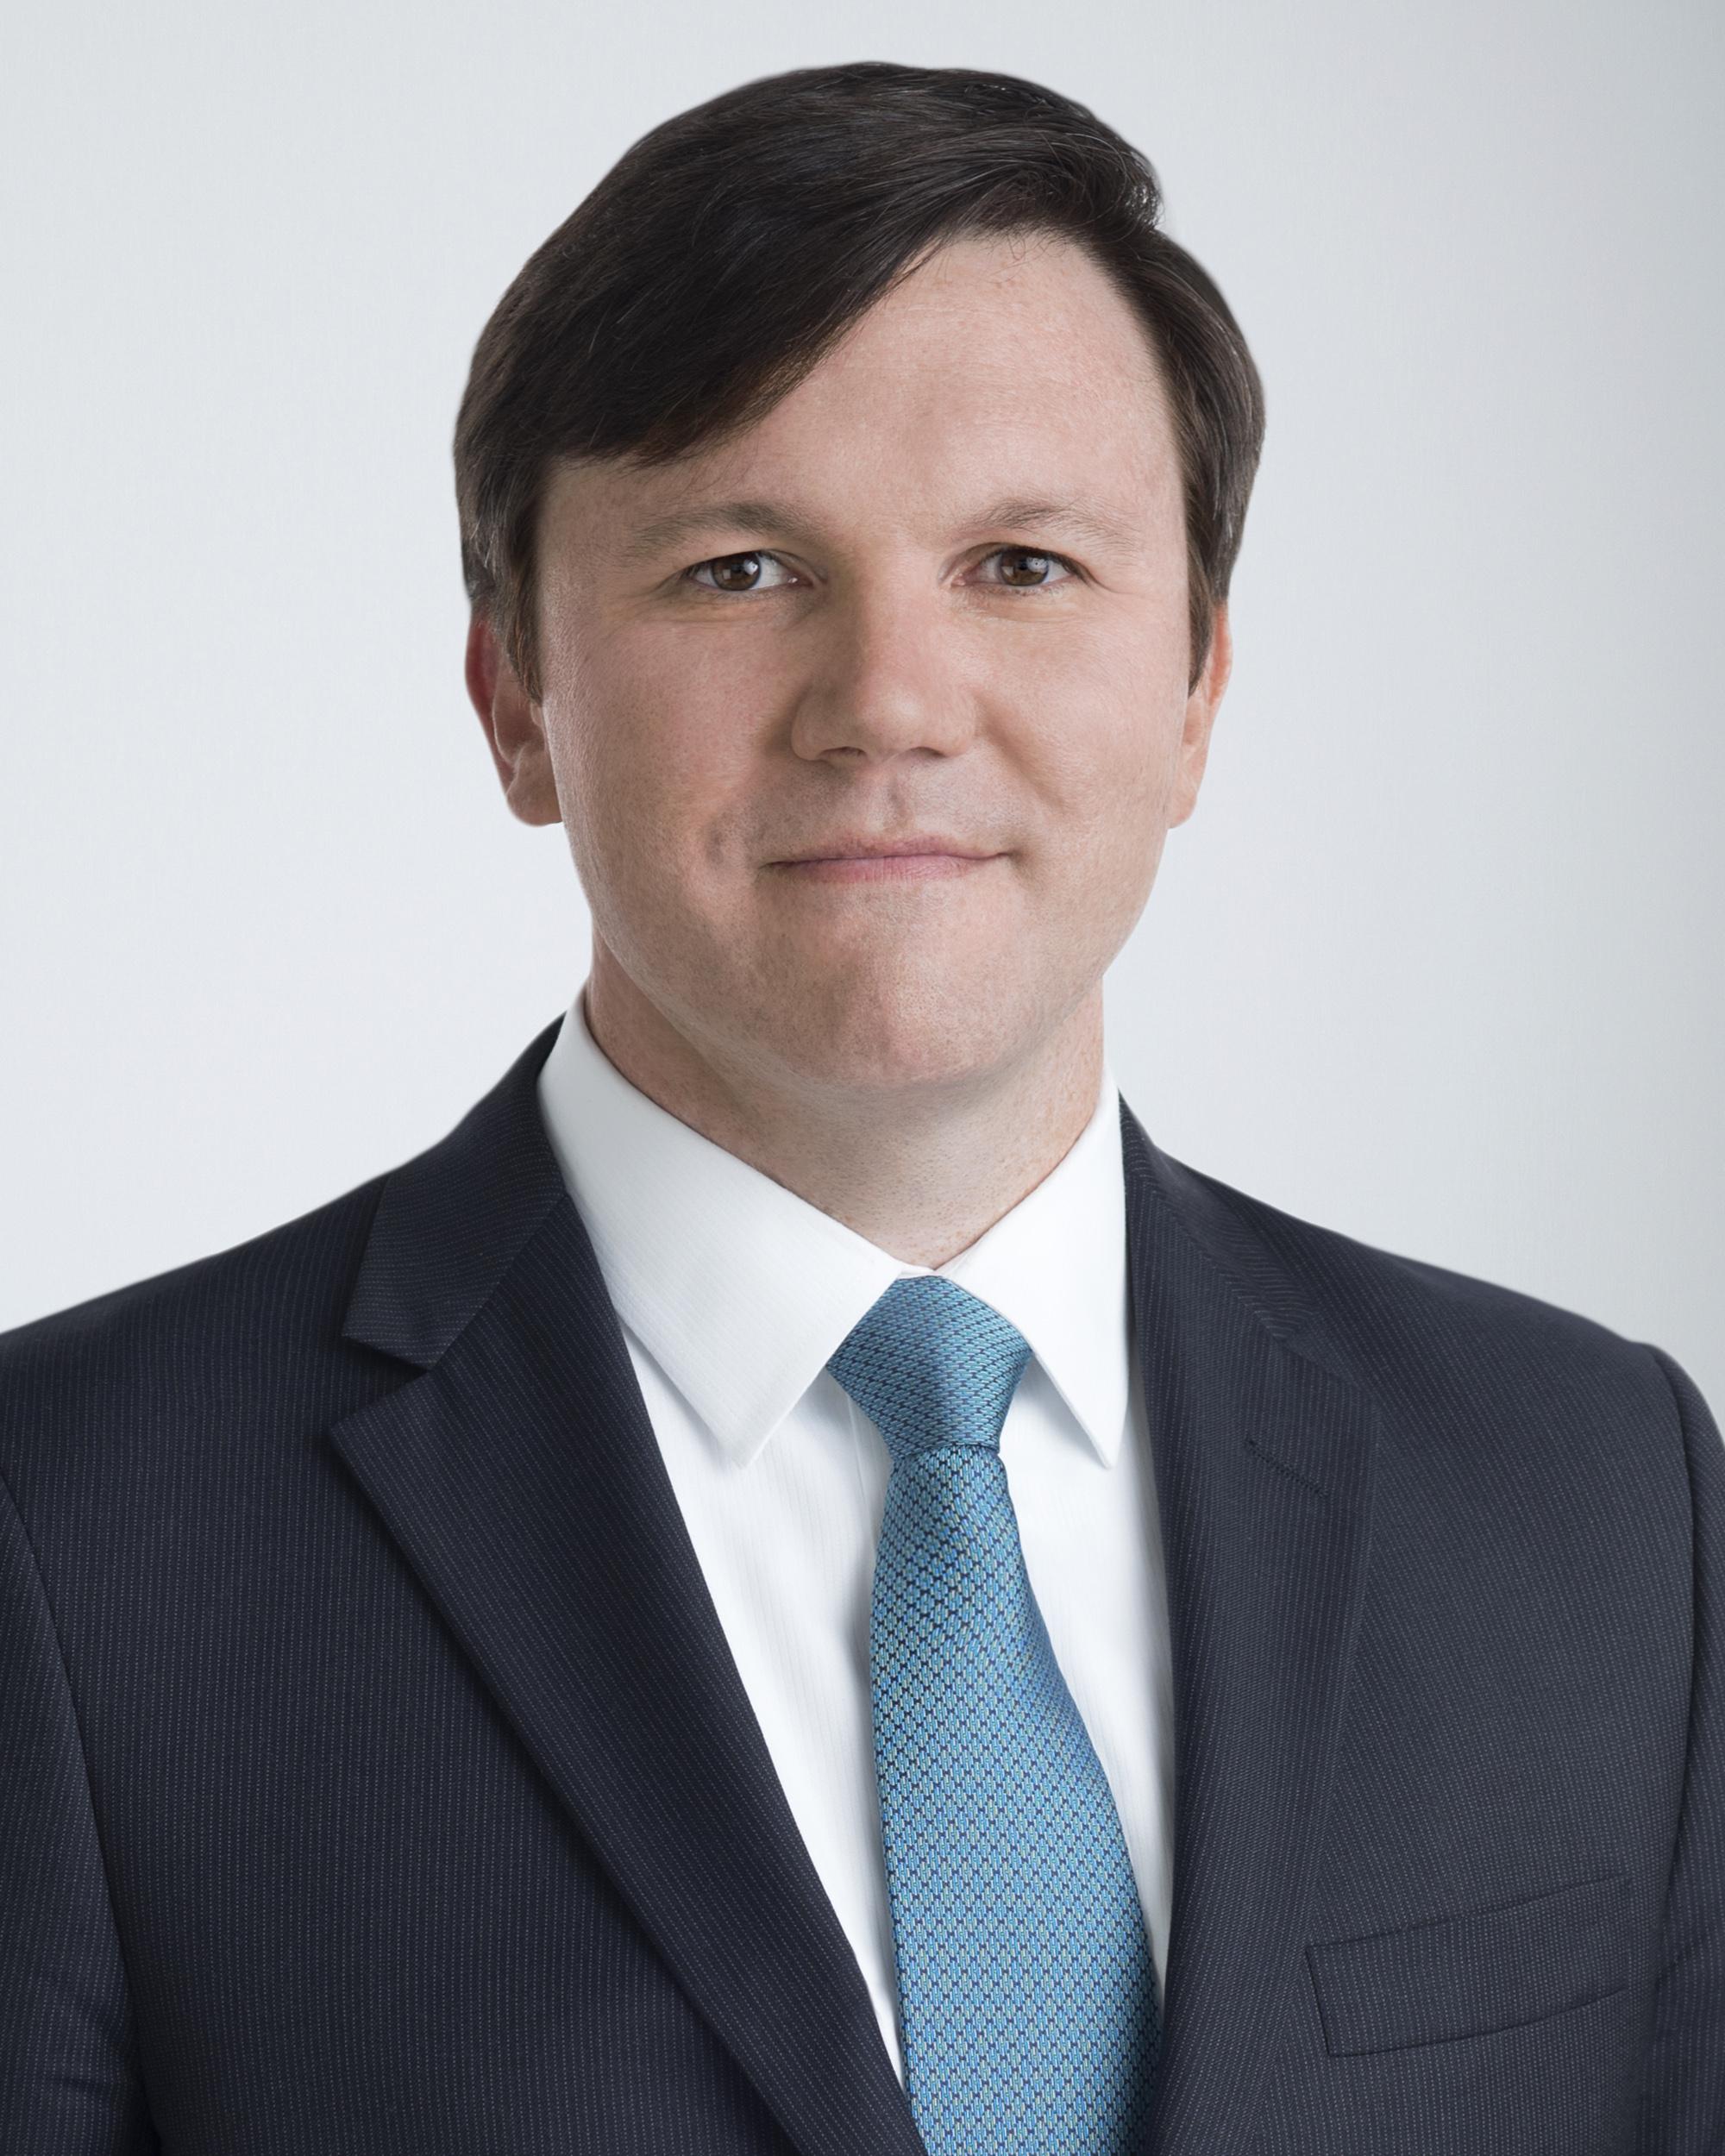 DOJ national security advisor moves to private practice